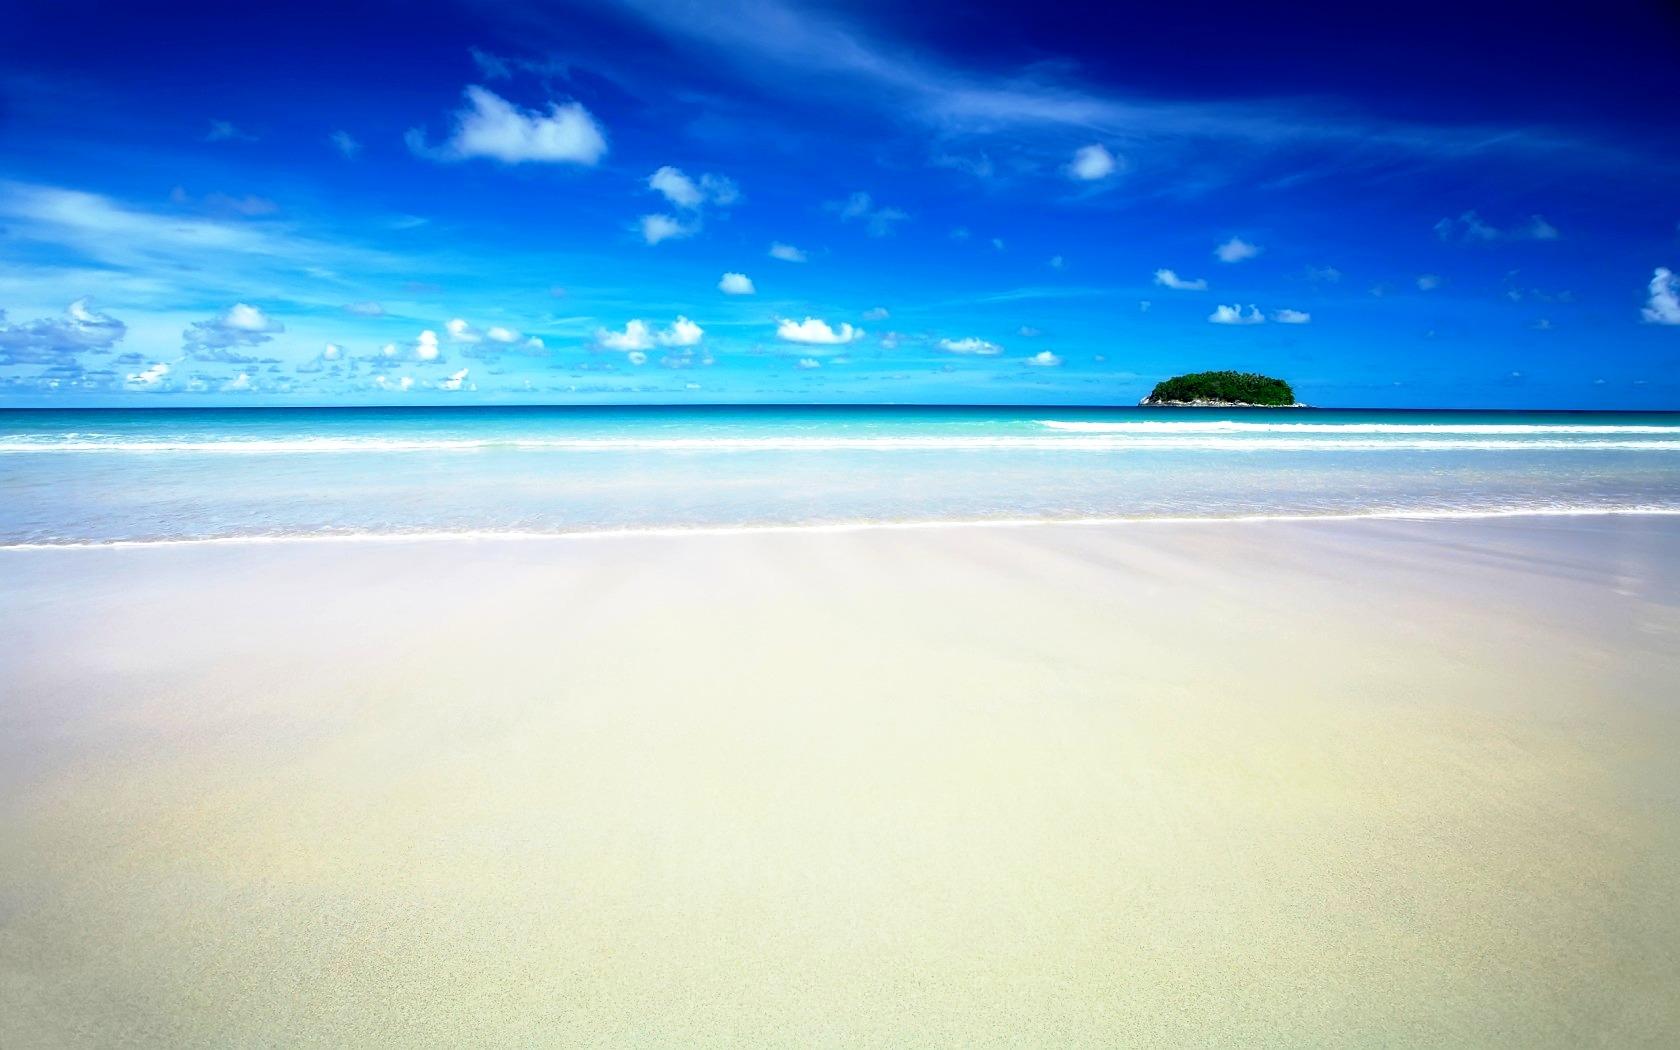 ... Up Your Working Space : Free Desktop Wallpaper Beach Scenes Nice Beach